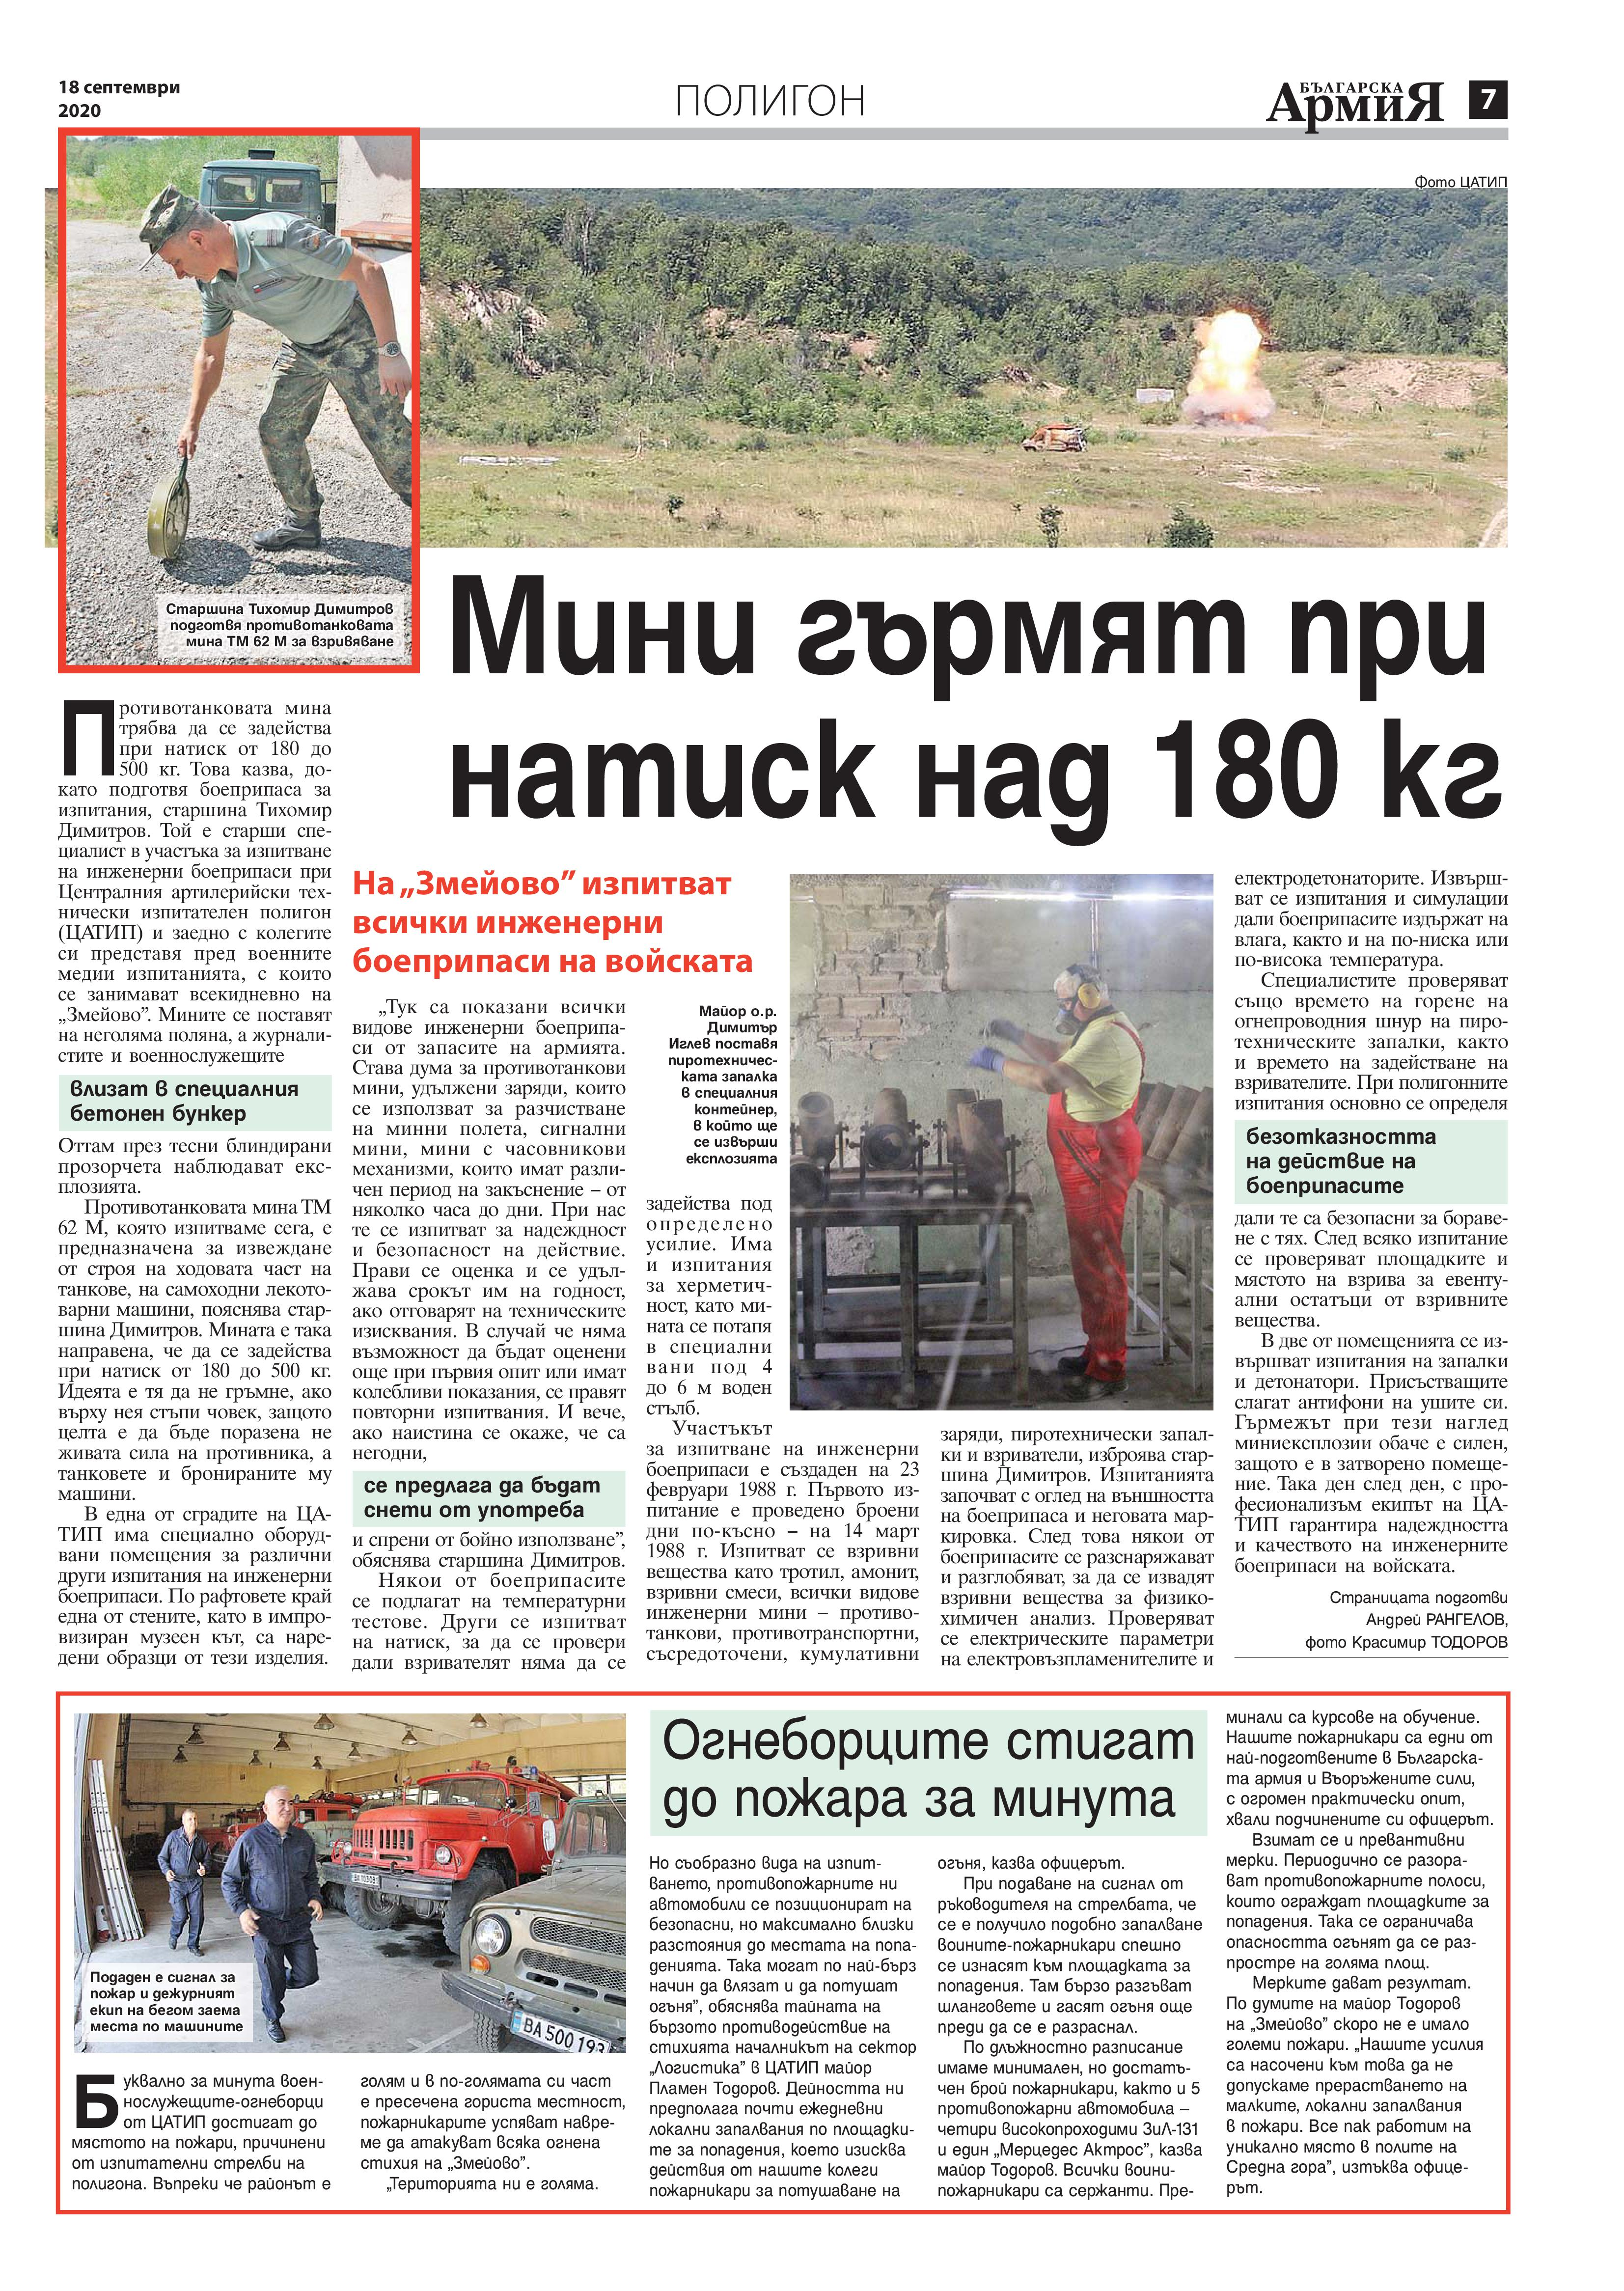 https://armymedia.bg/wp-content/uploads/2015/06/07-40.jpg